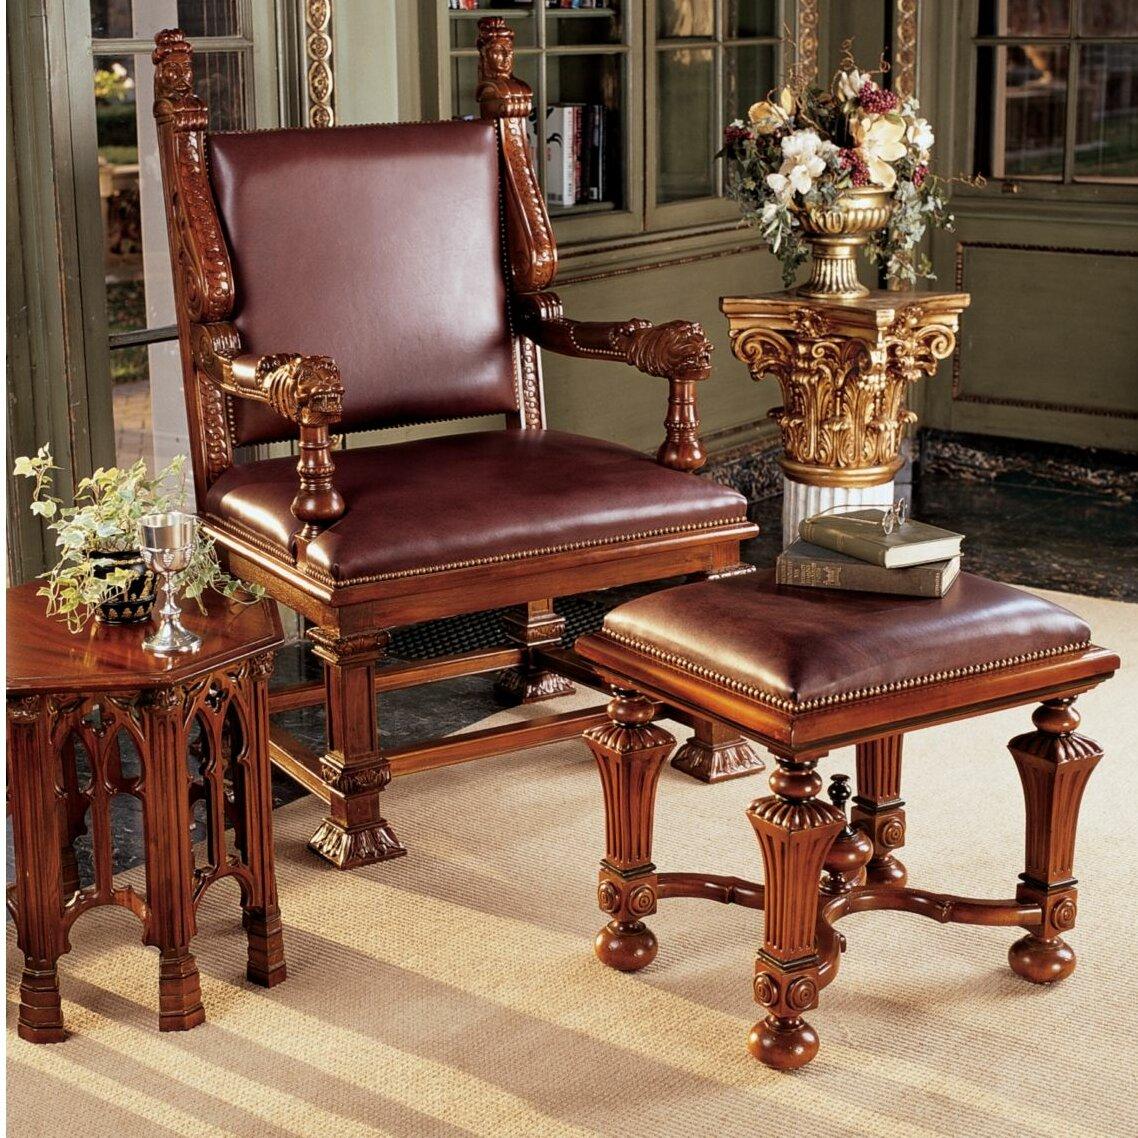 Design Toscano Lord Cumberlandu0027s Throne Armchair And Footstool Set | Wayfair